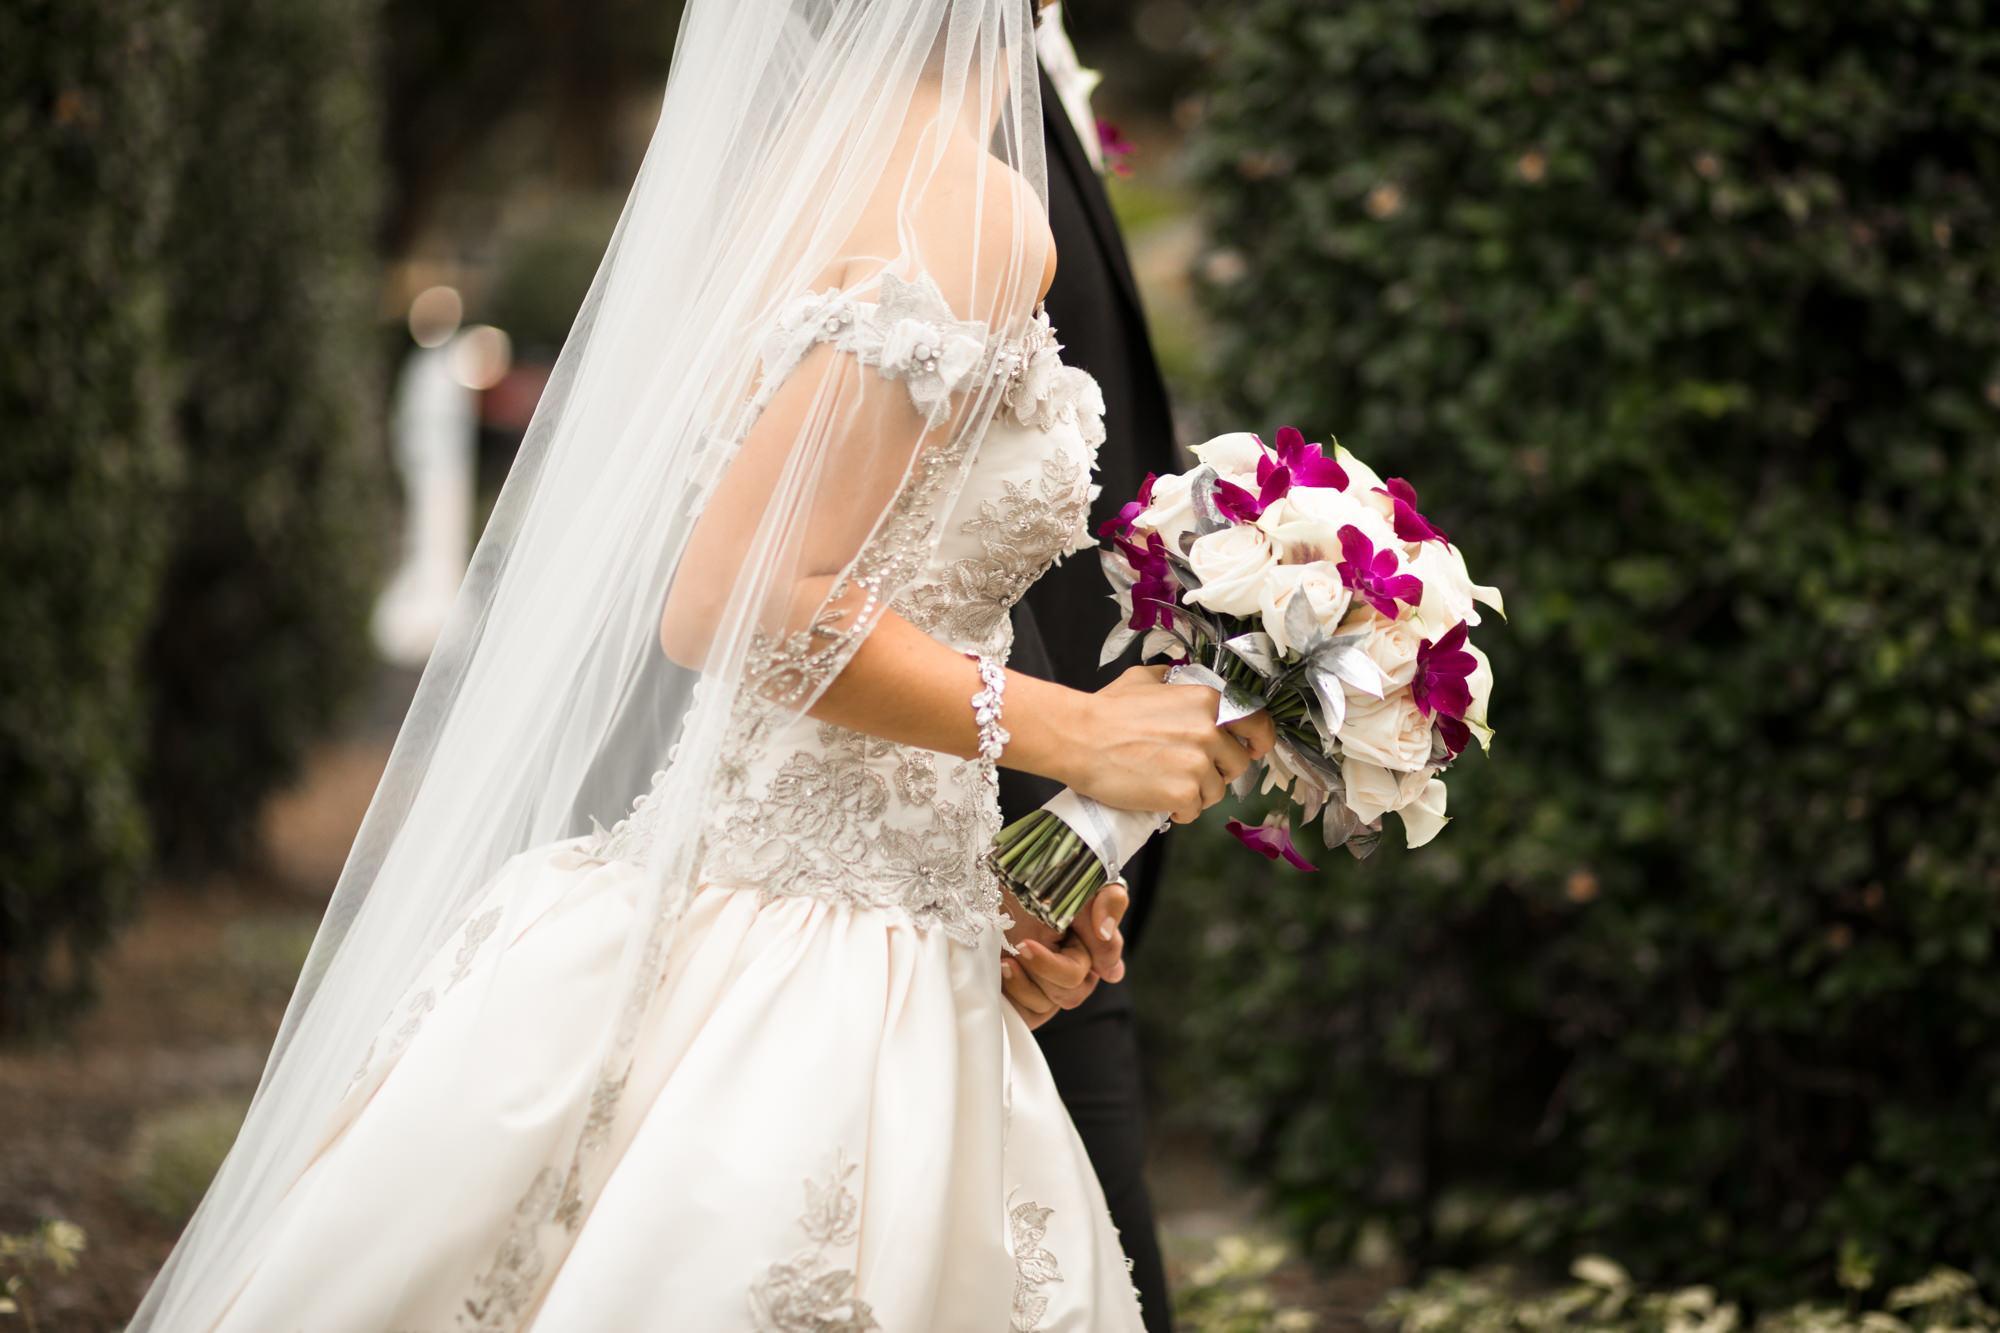 Benvenuto_Wedding_catholic_Florida_Bride-Groom-71.jpg